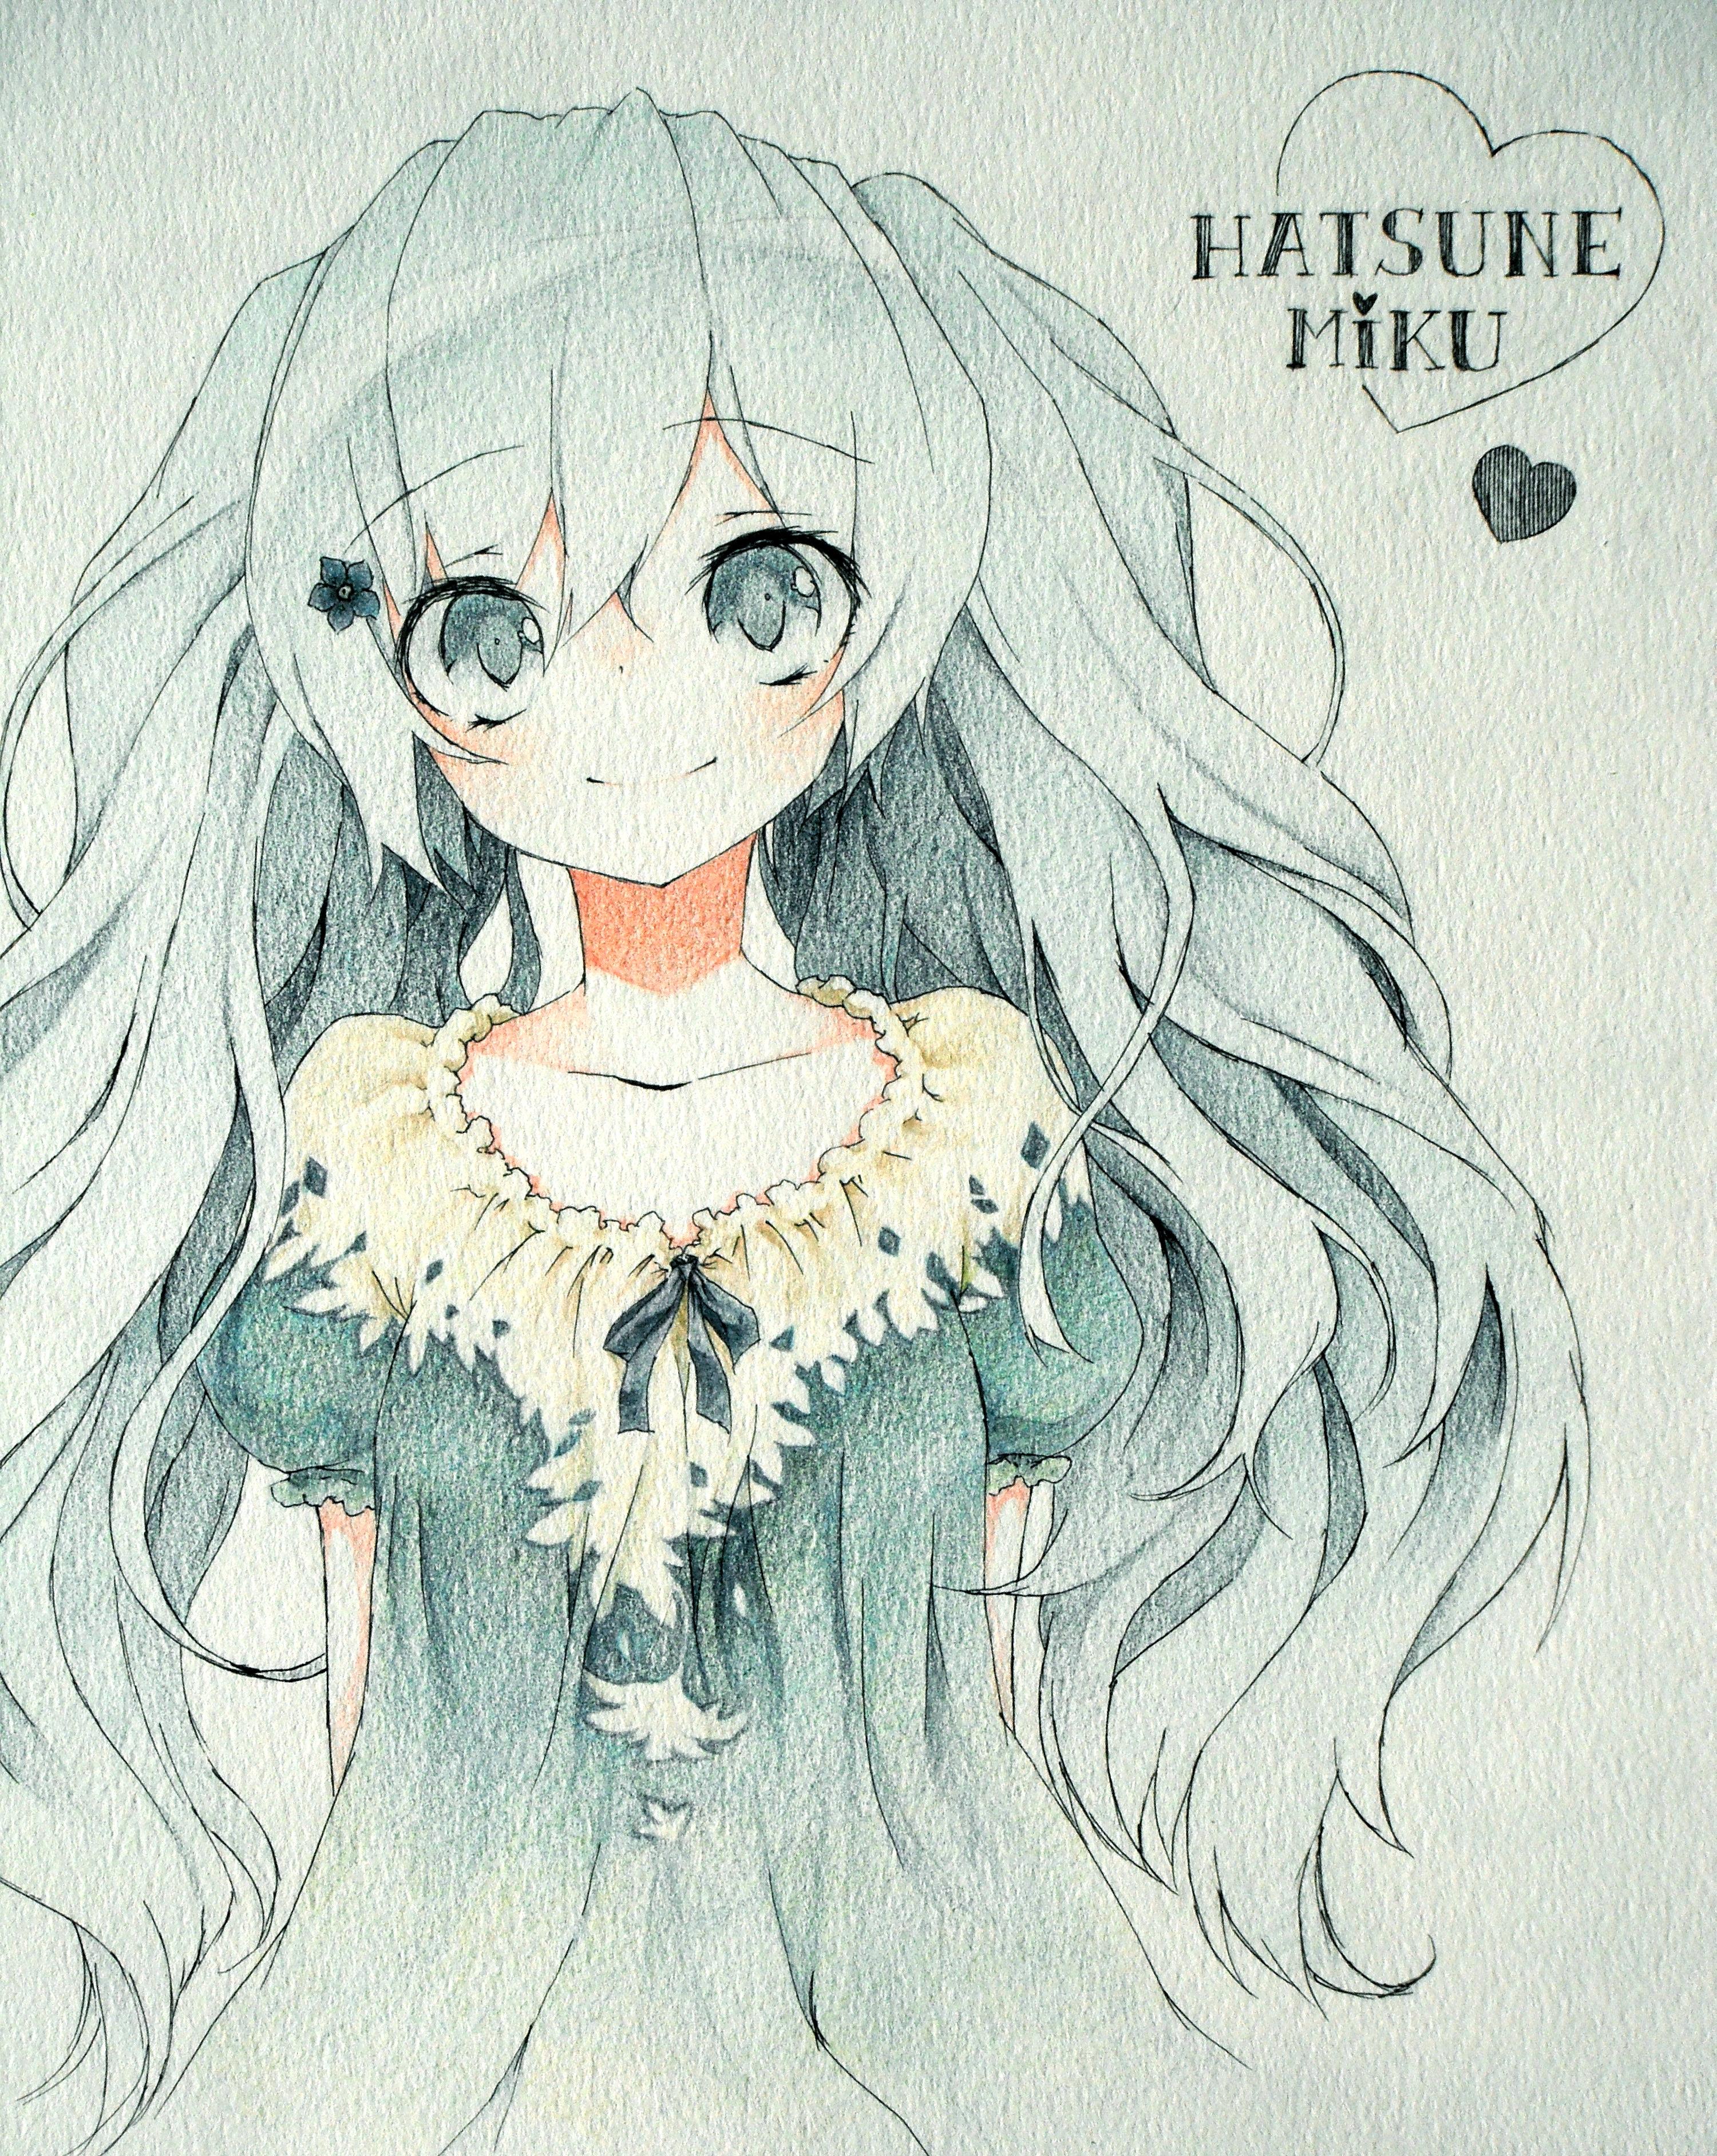 Colored Pencil Medium Traditional Media Zerochan Anime Image Board